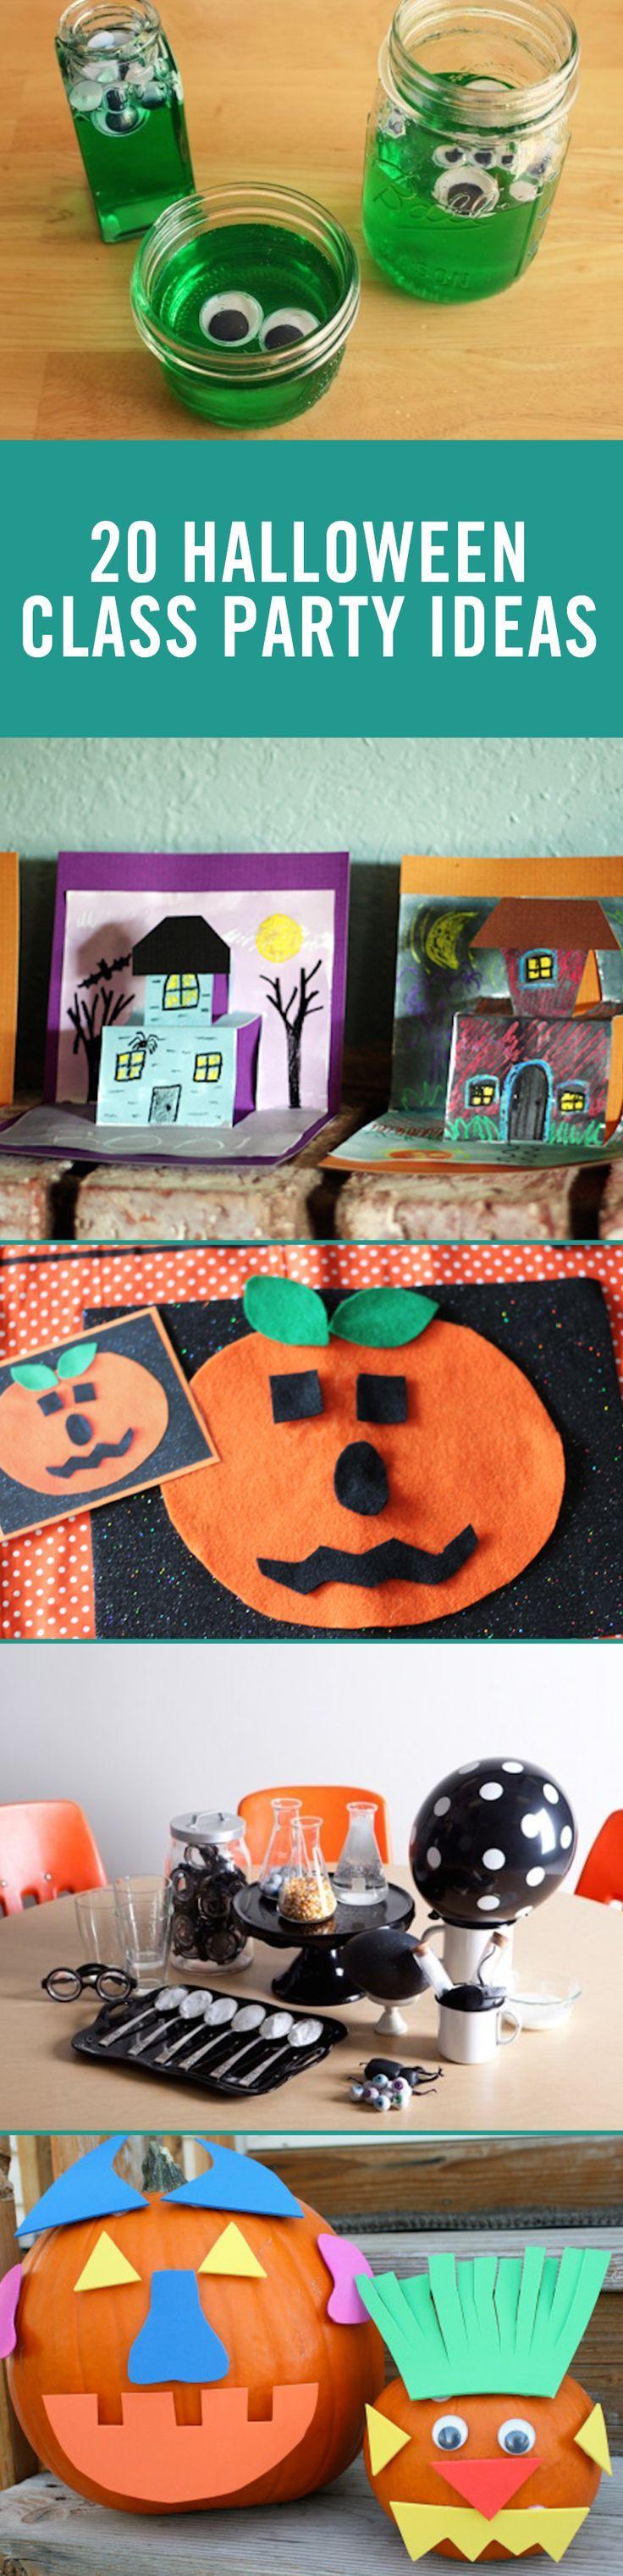 6th grade christmas party ideas - 20 Halloween Classroom Party Ideas